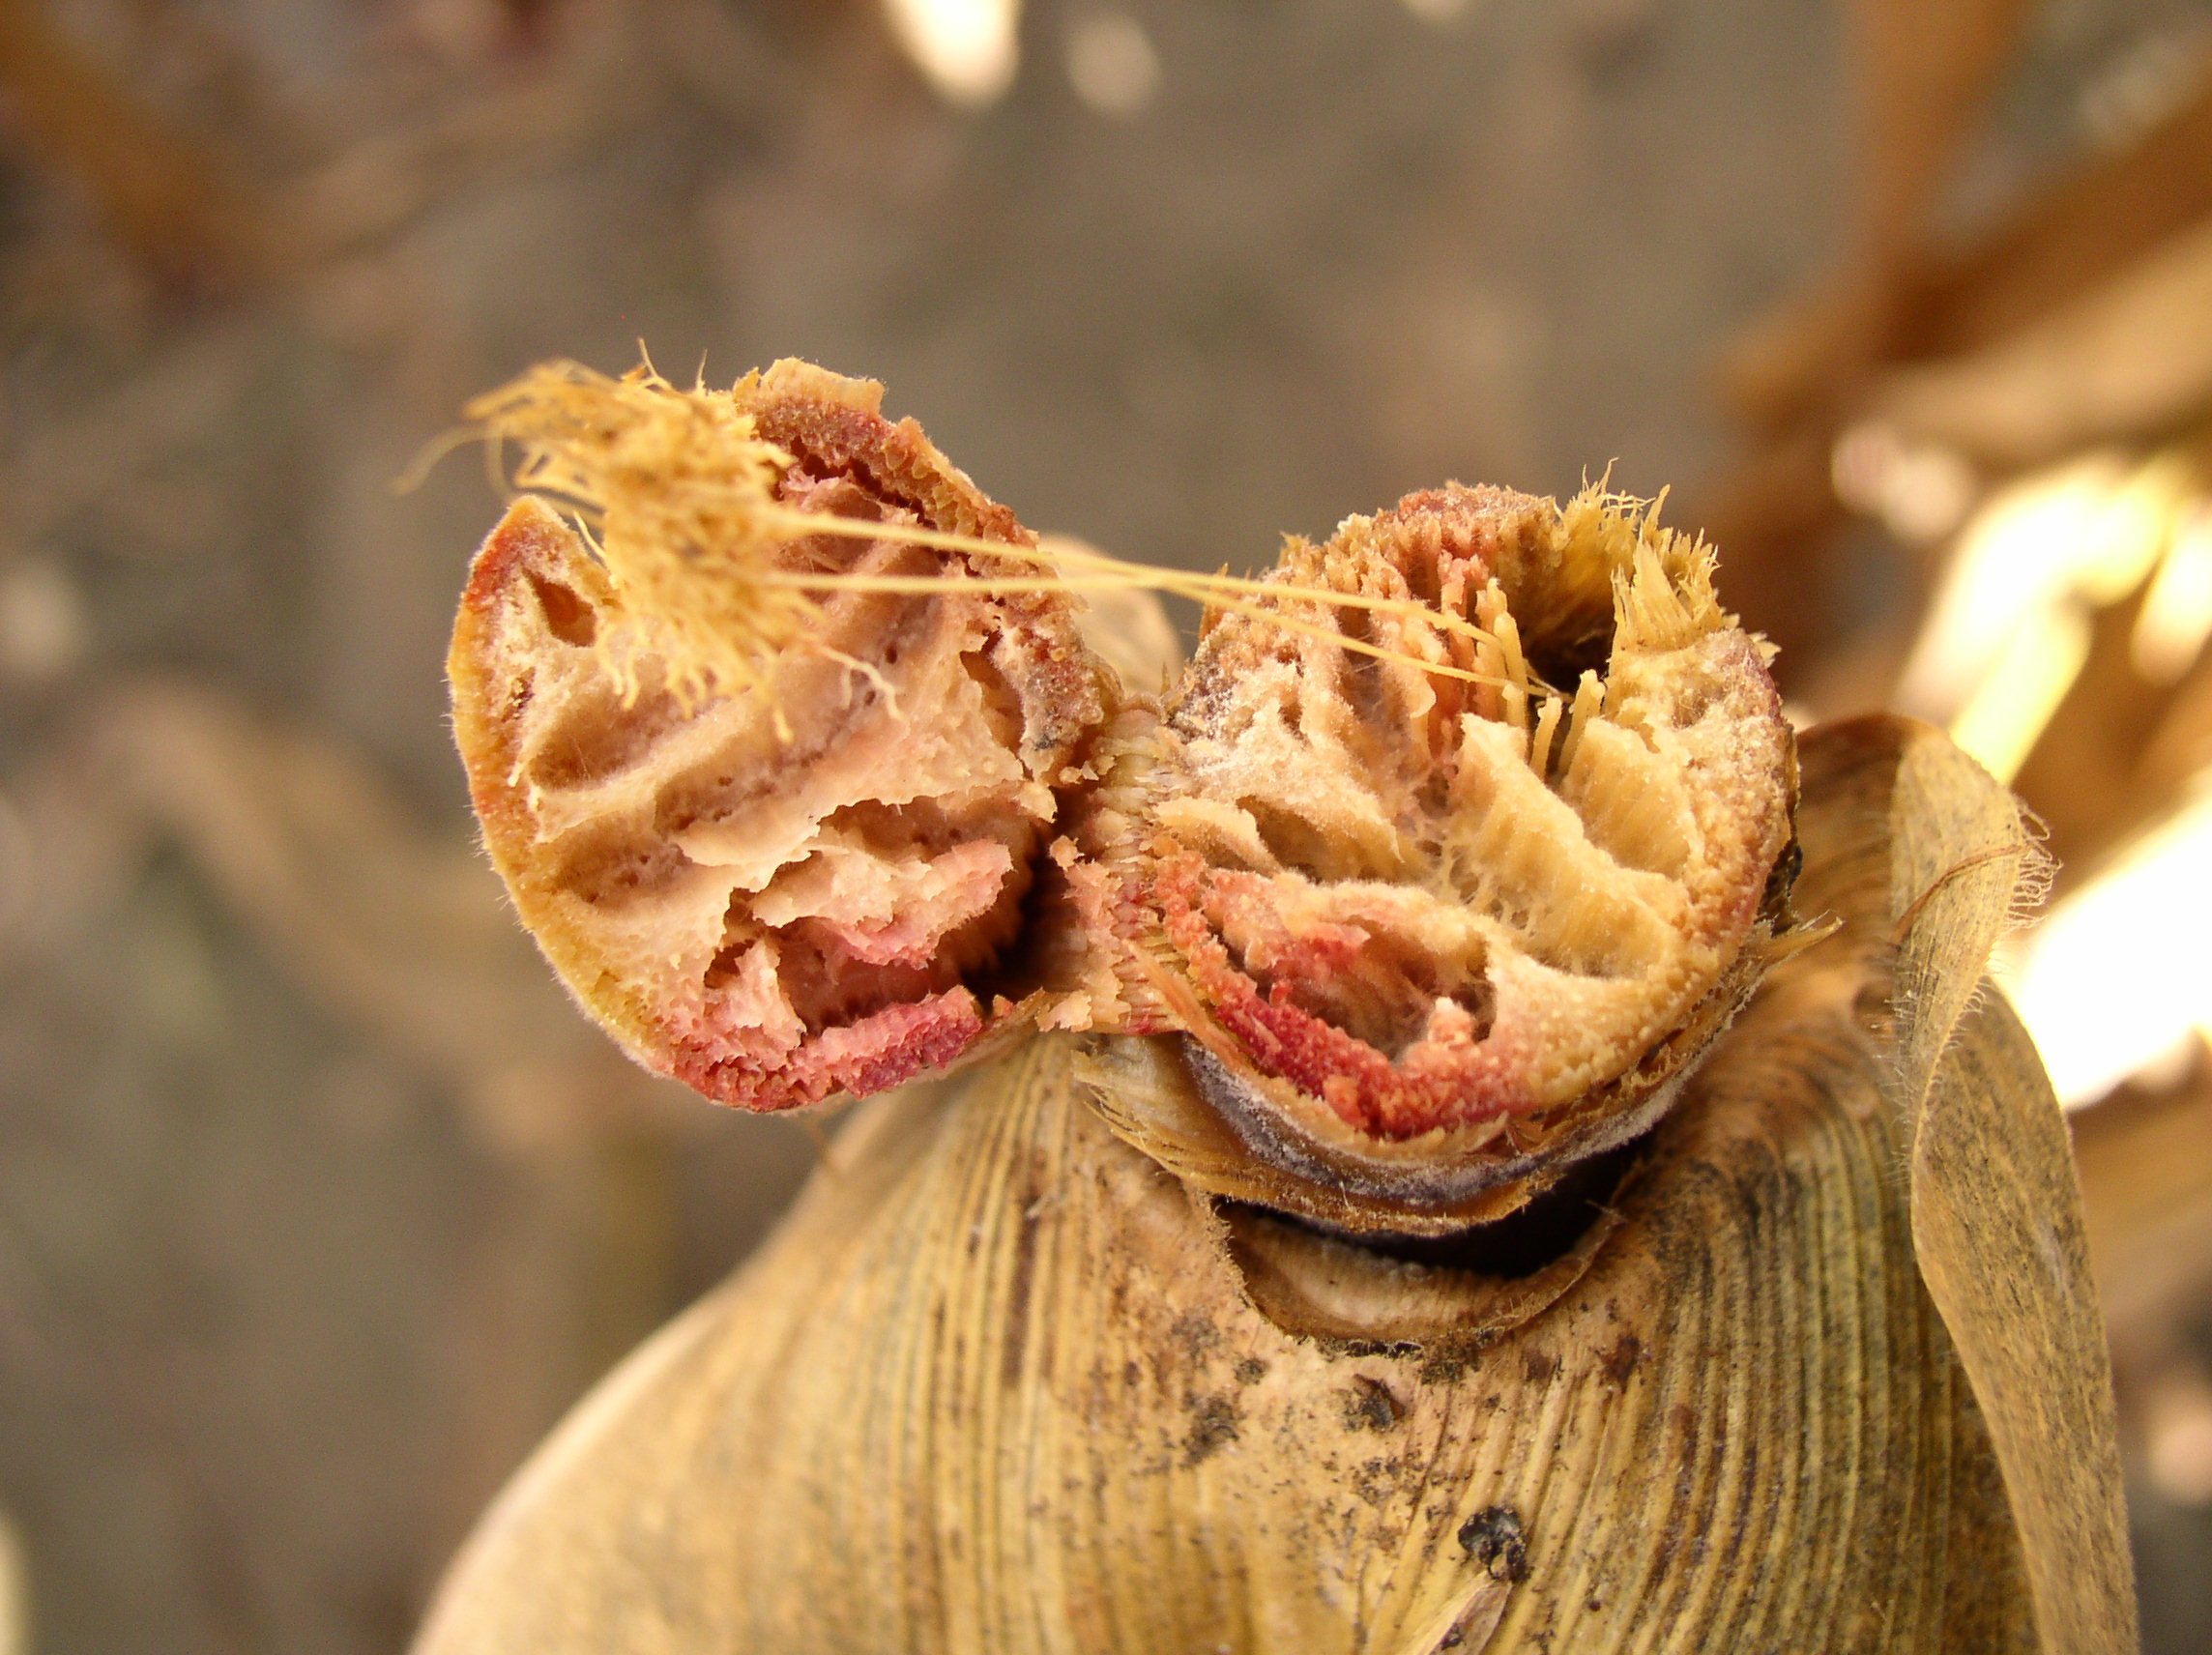 Internal stalk discoloration indicative of Gibberella stalk rot.